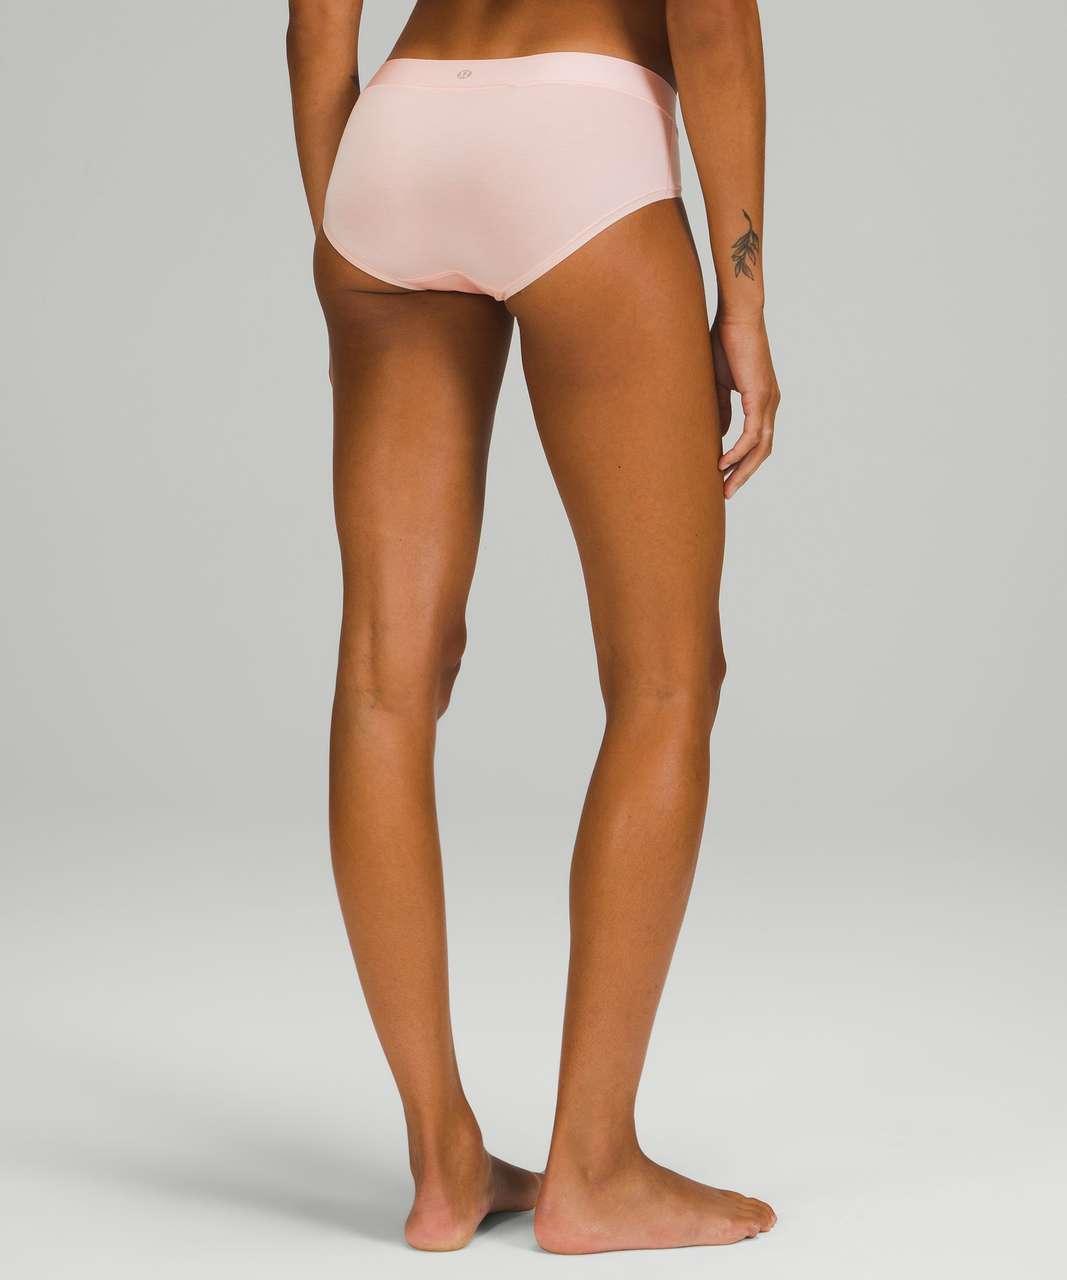 Lululemon UnderEase Mid Rise Hipster Underwear 3 Pack - Heritage 365 Camo Mini Pecan Tan Multi / Pink Mist / Black